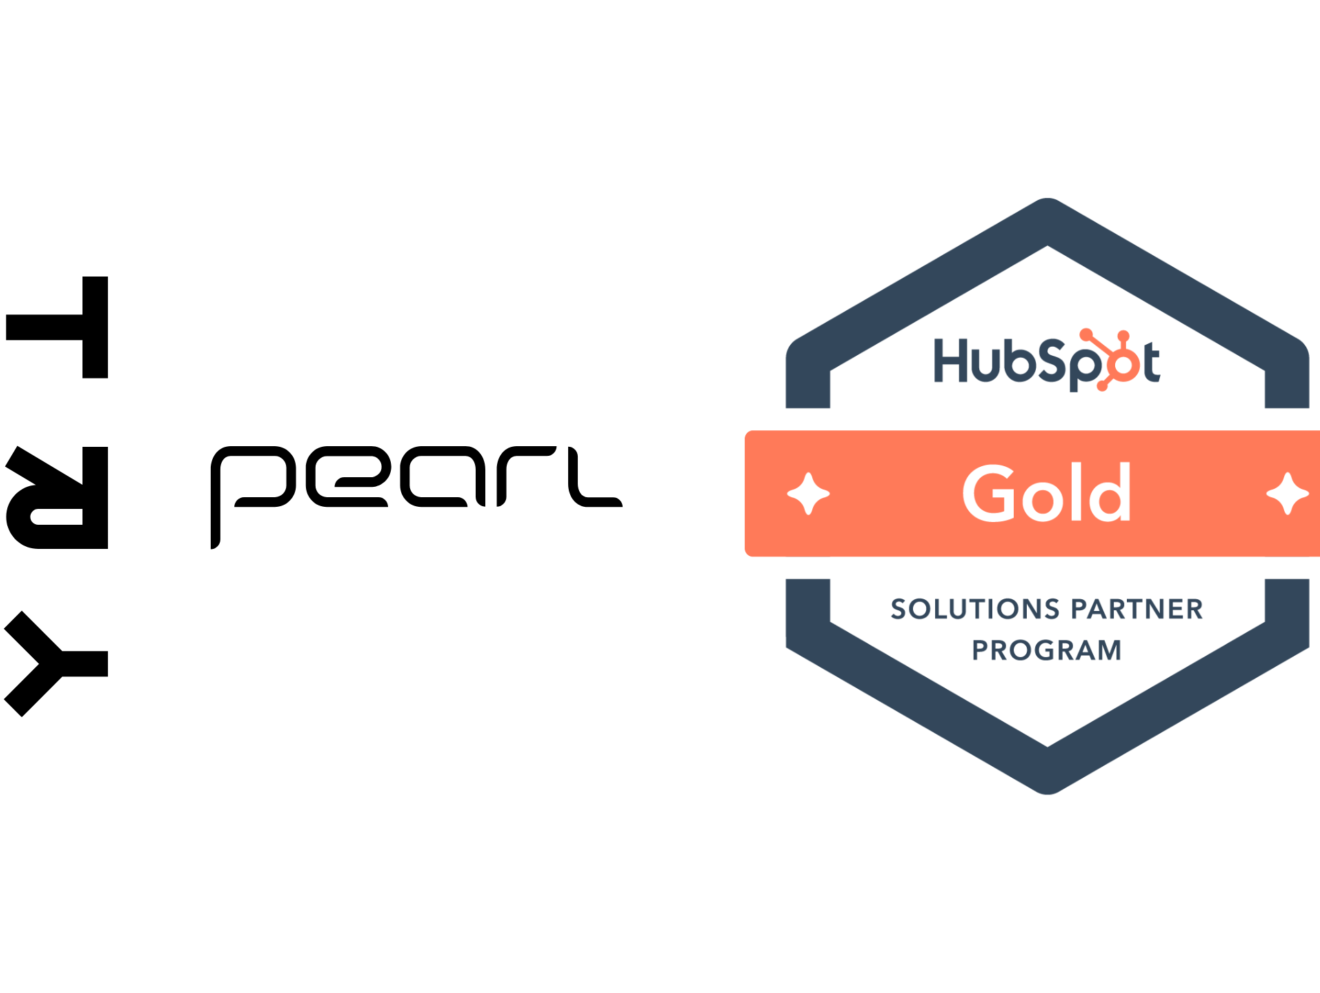 trypearl_hubspot_gold_partner